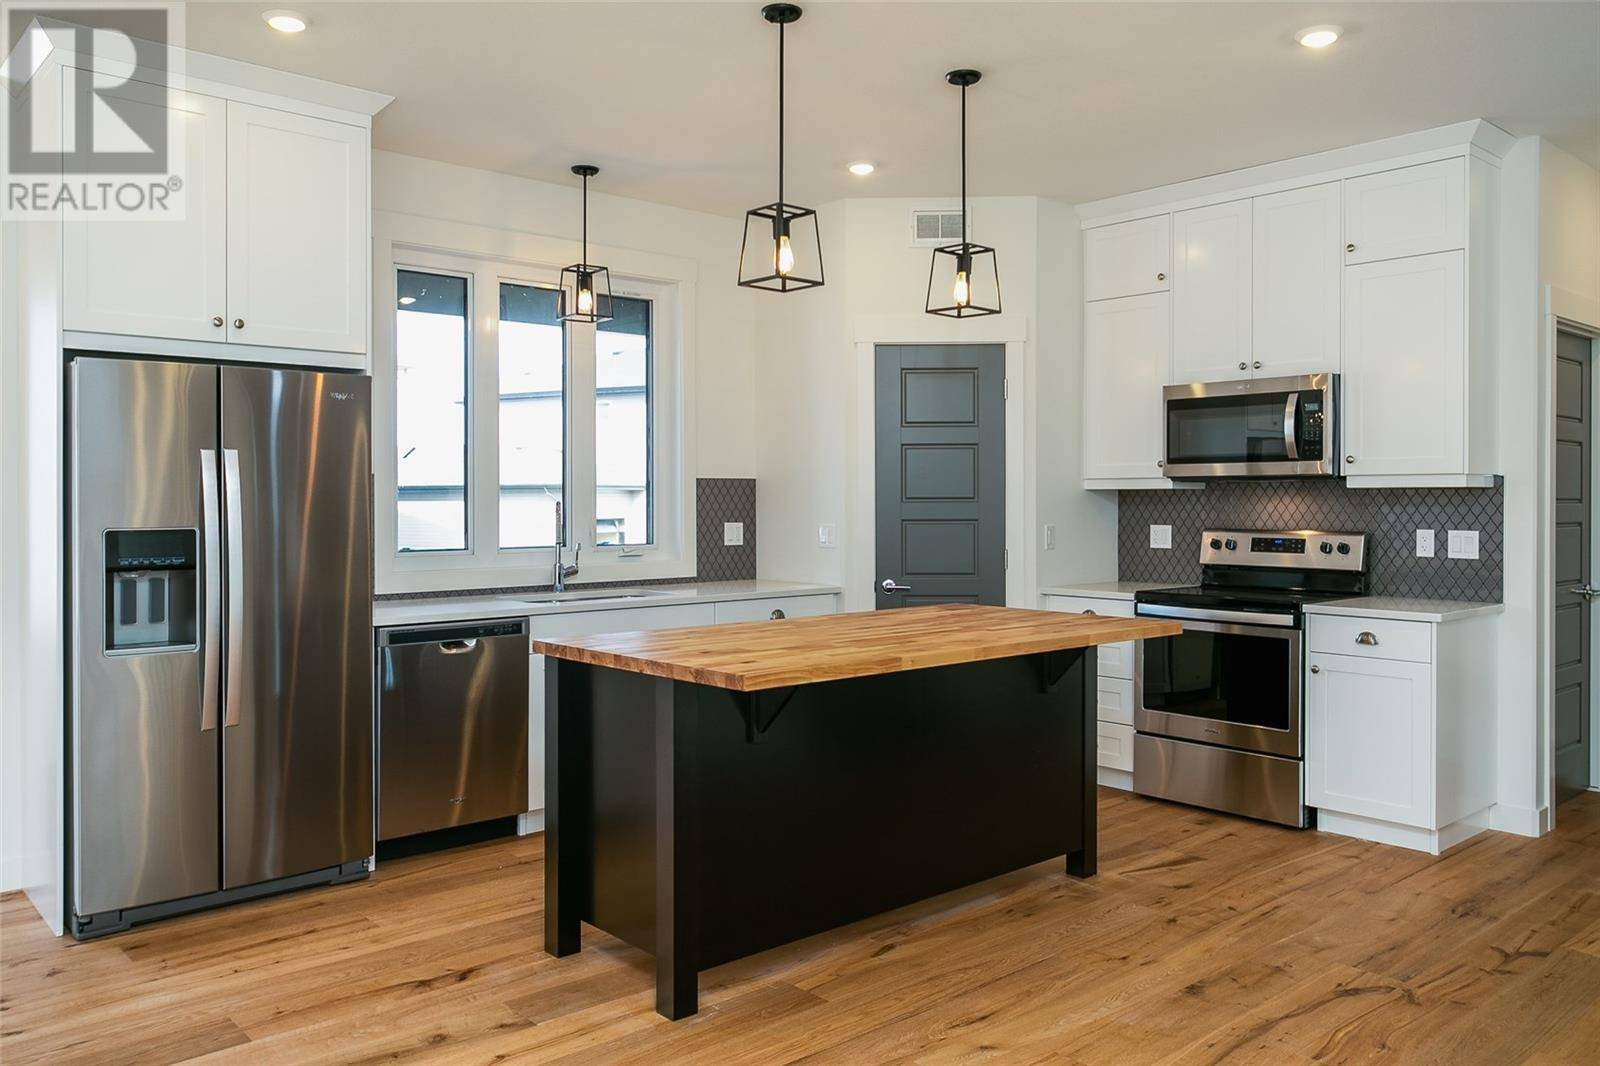 House for sale at 324 Bolstad Wy Saskatoon Saskatchewan - MLS: SK783463